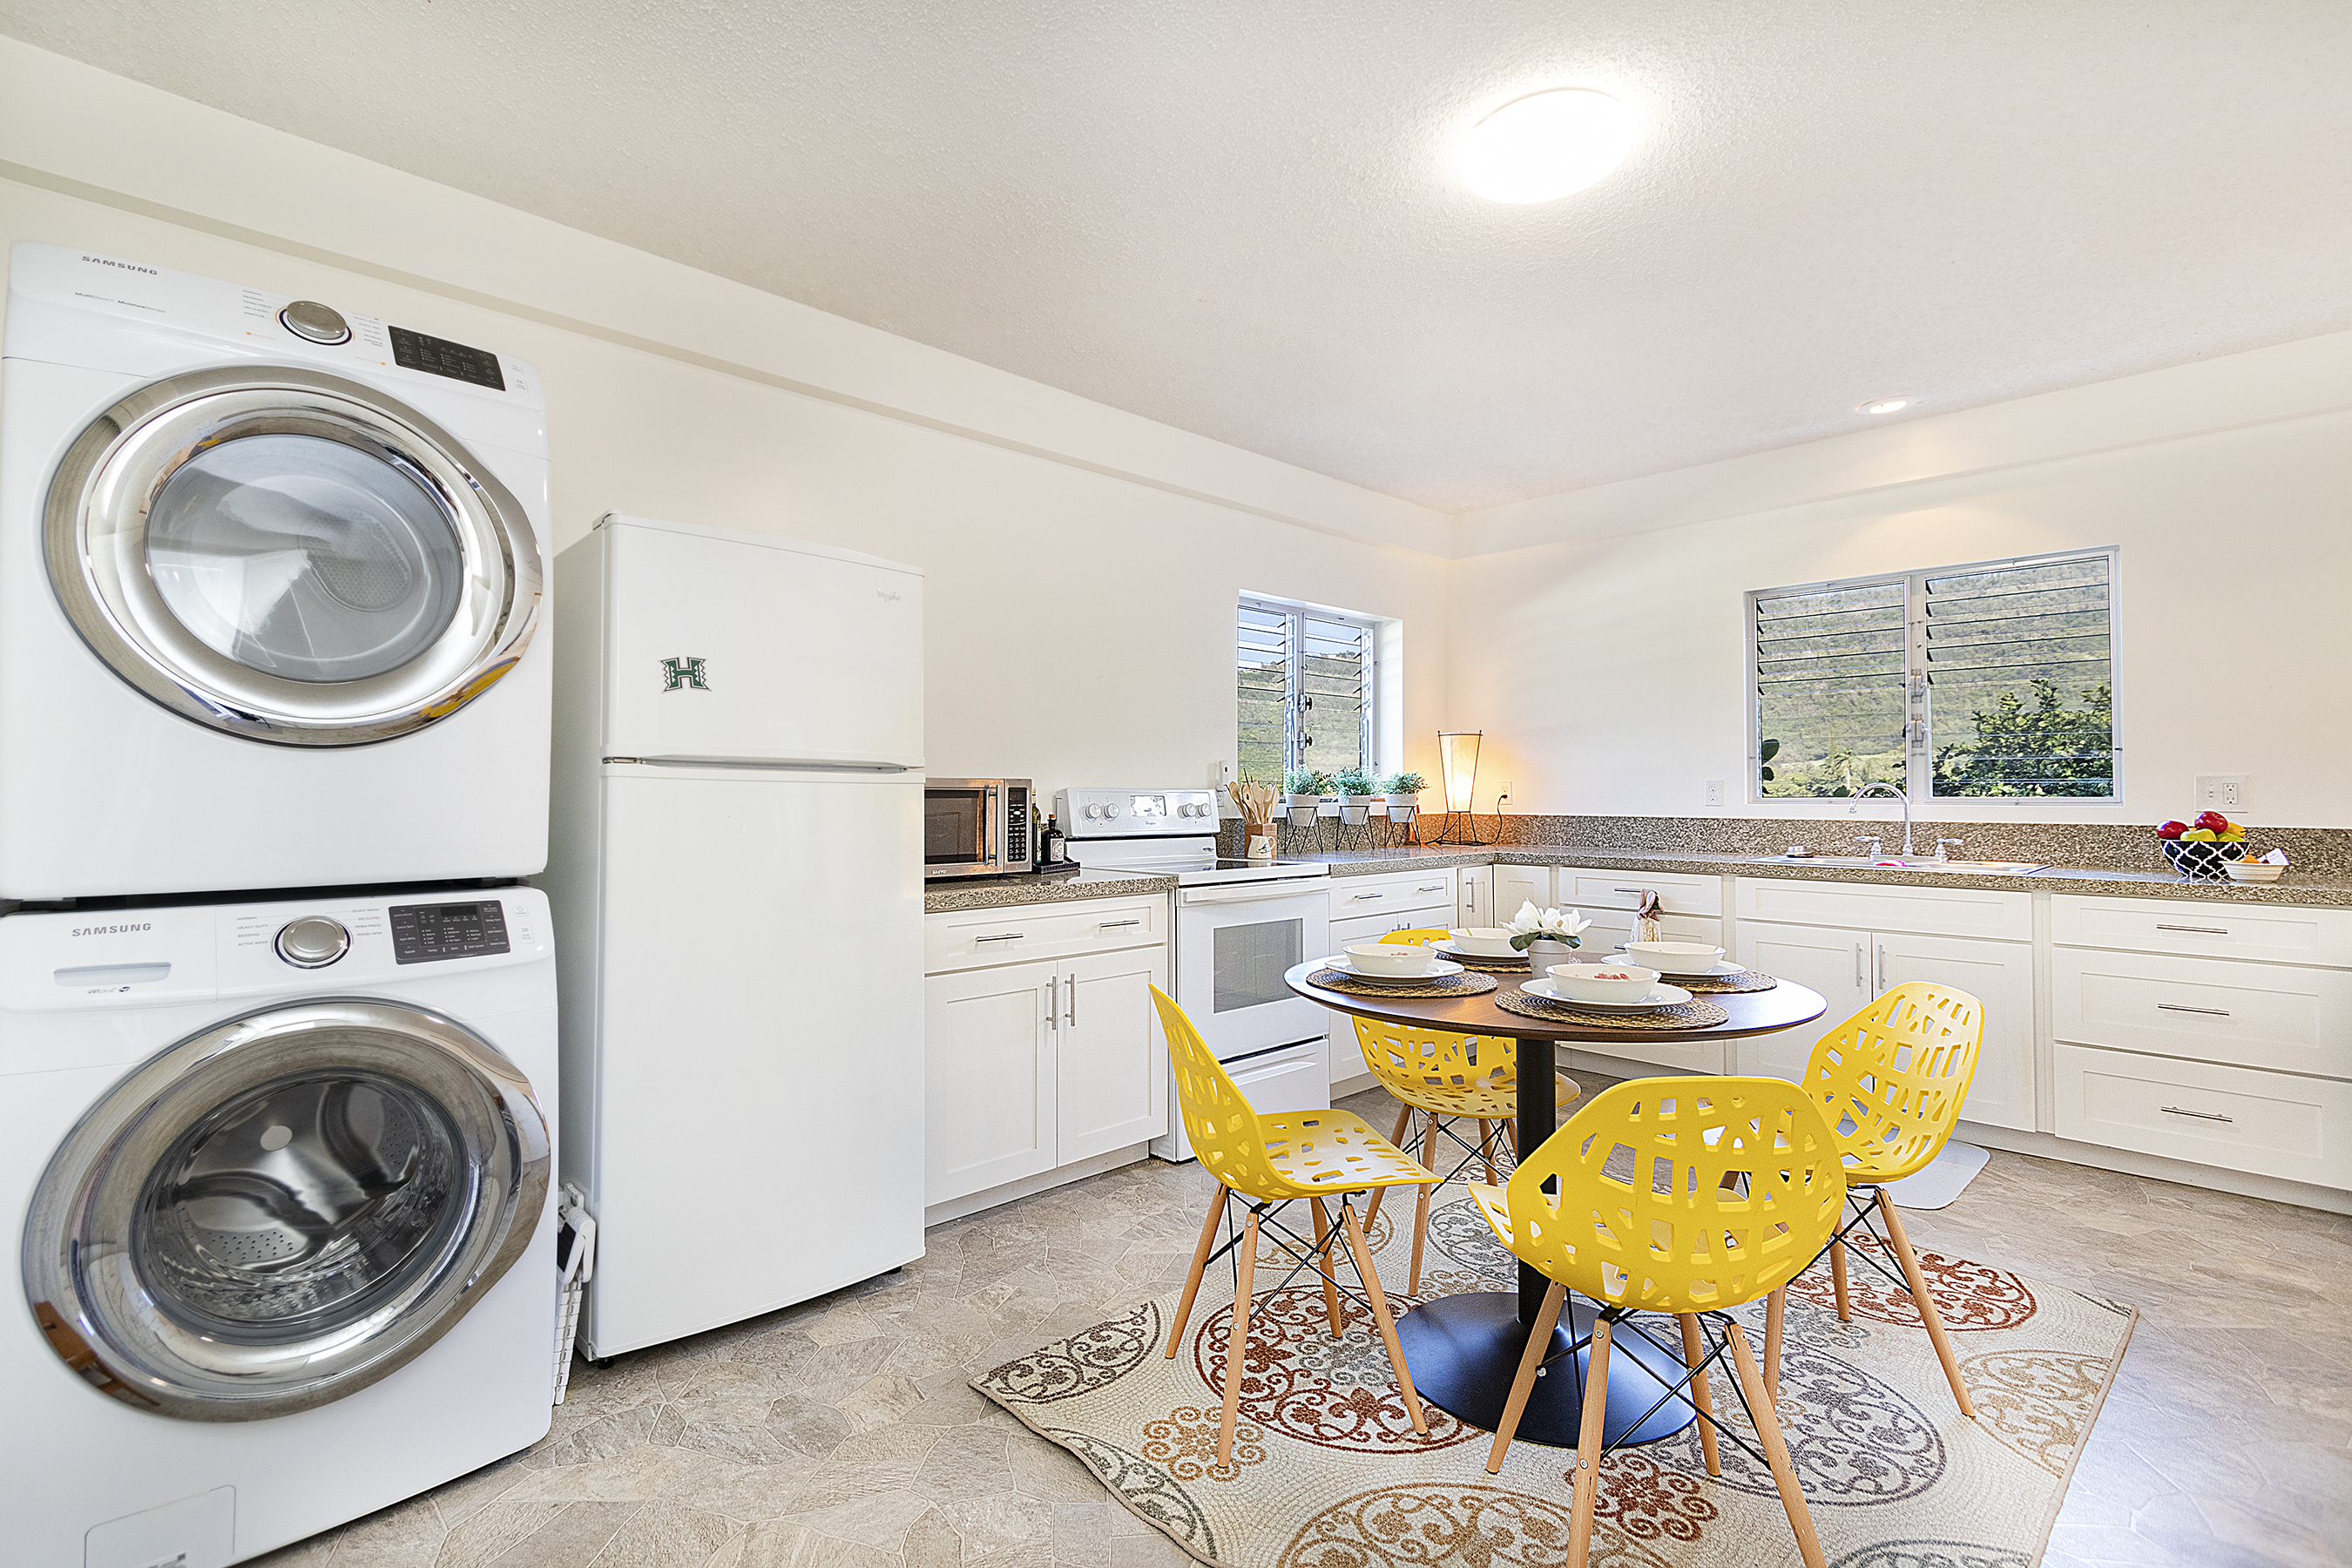 Downstairs Kitchen and Laundry Area at 380 Puiwa Road, Honolulu, HI 96817